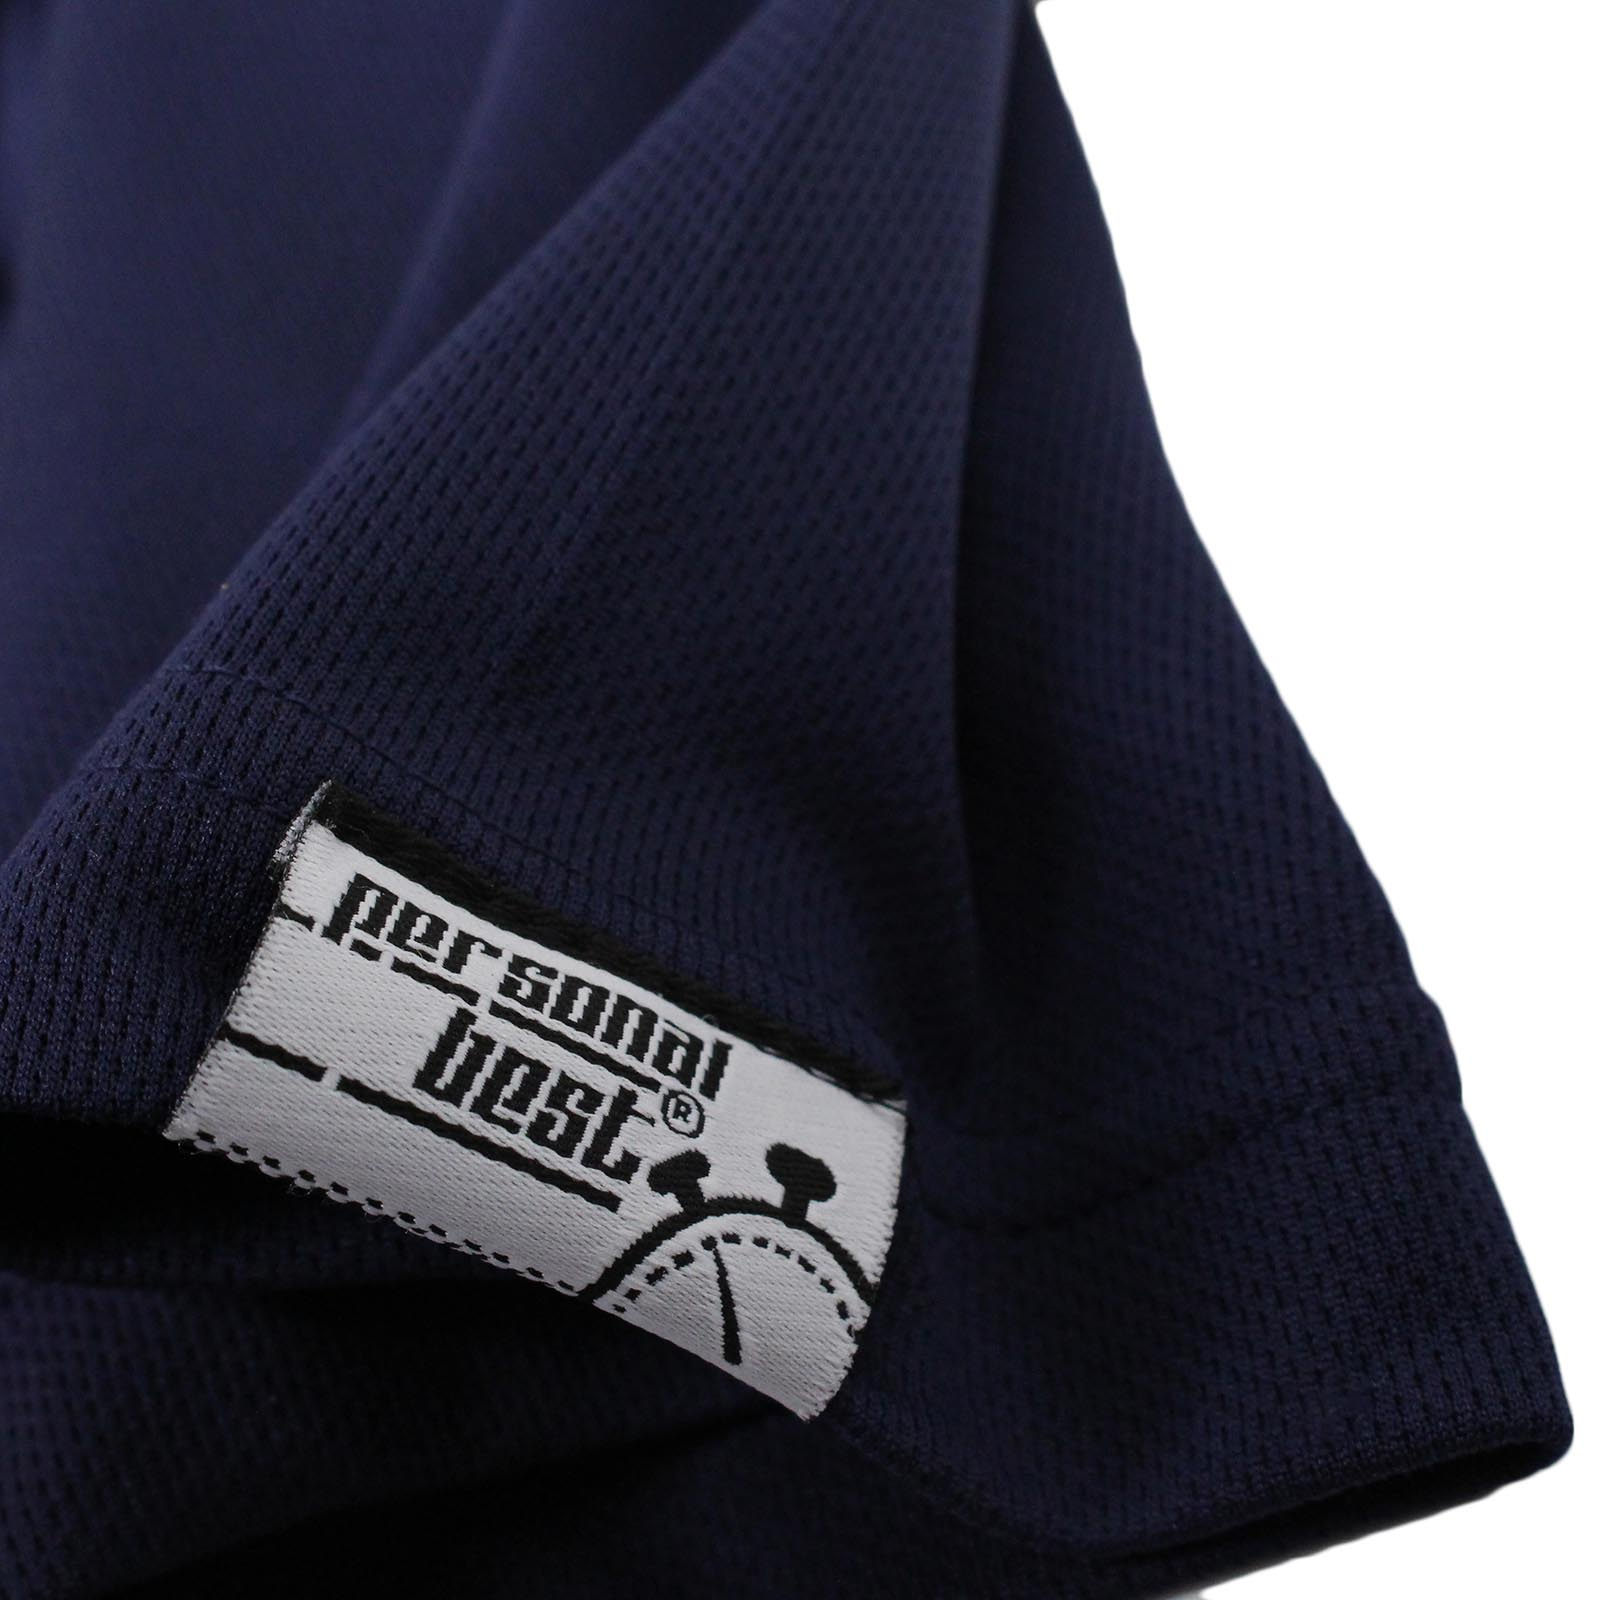 26.2 Miles Premium Dry Fit Breathable Sports T-SHIRT Men/'s Personal Best